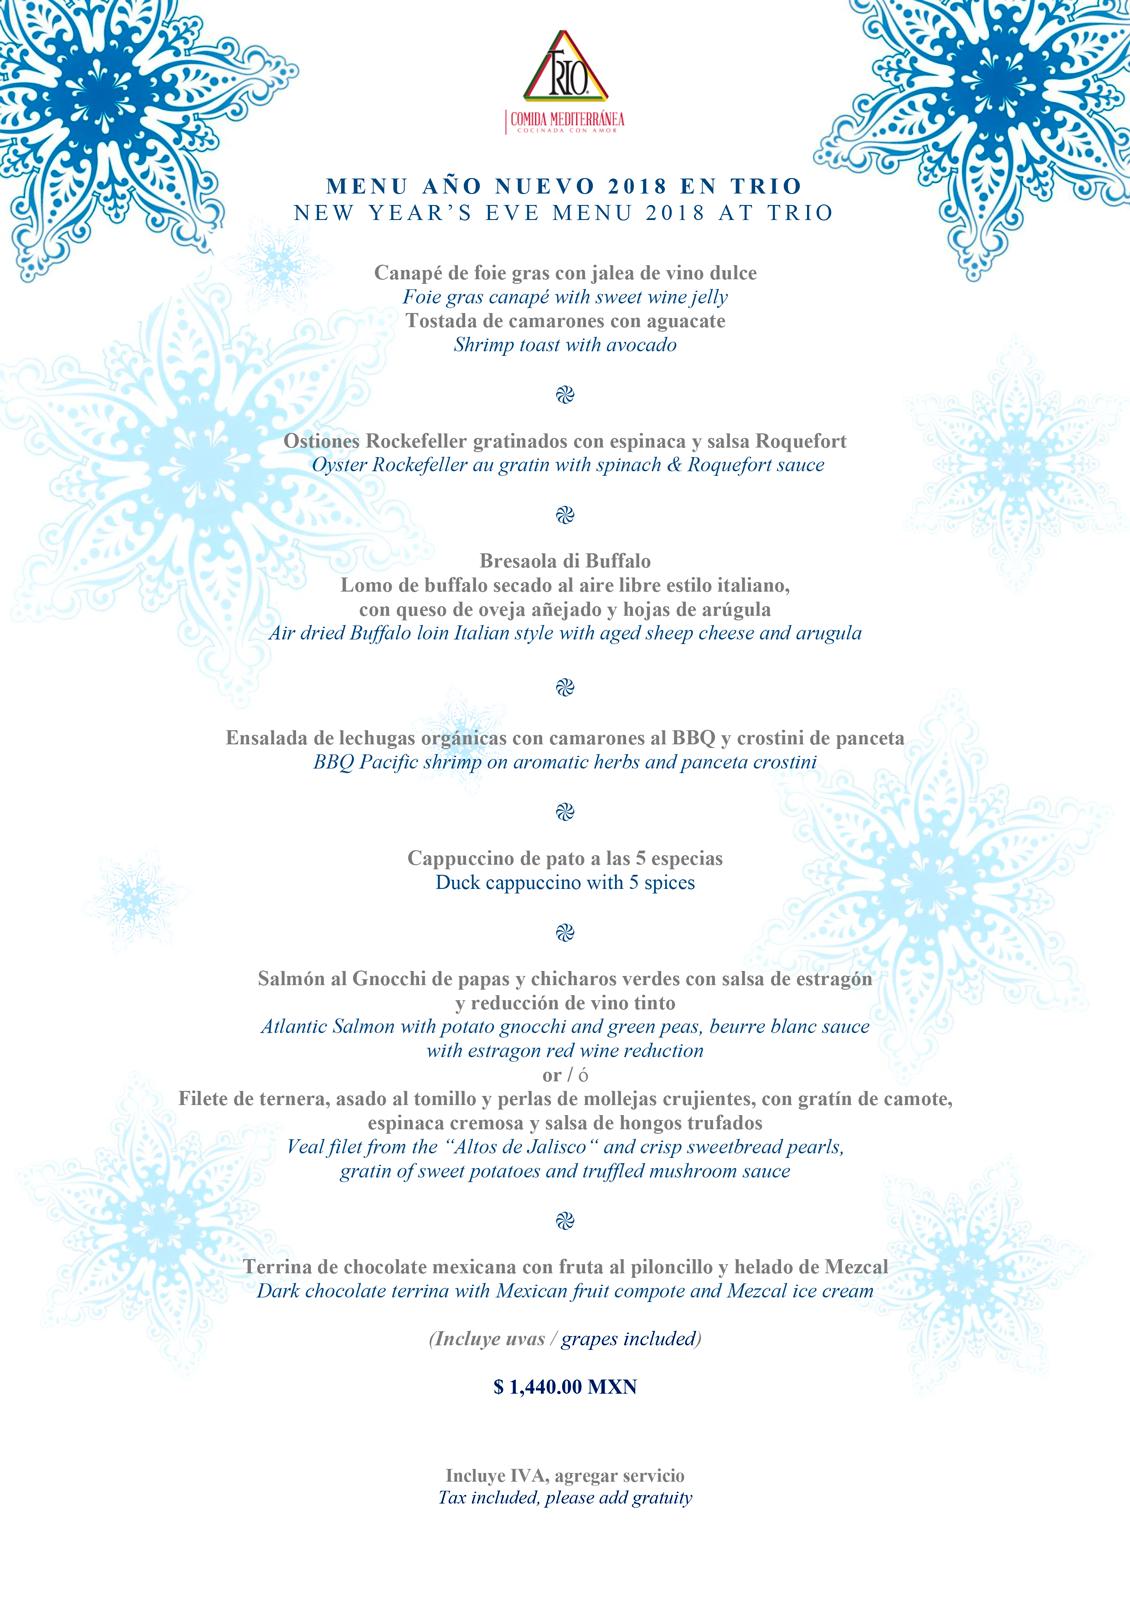 Restaurante Trio New Years Menu 2018